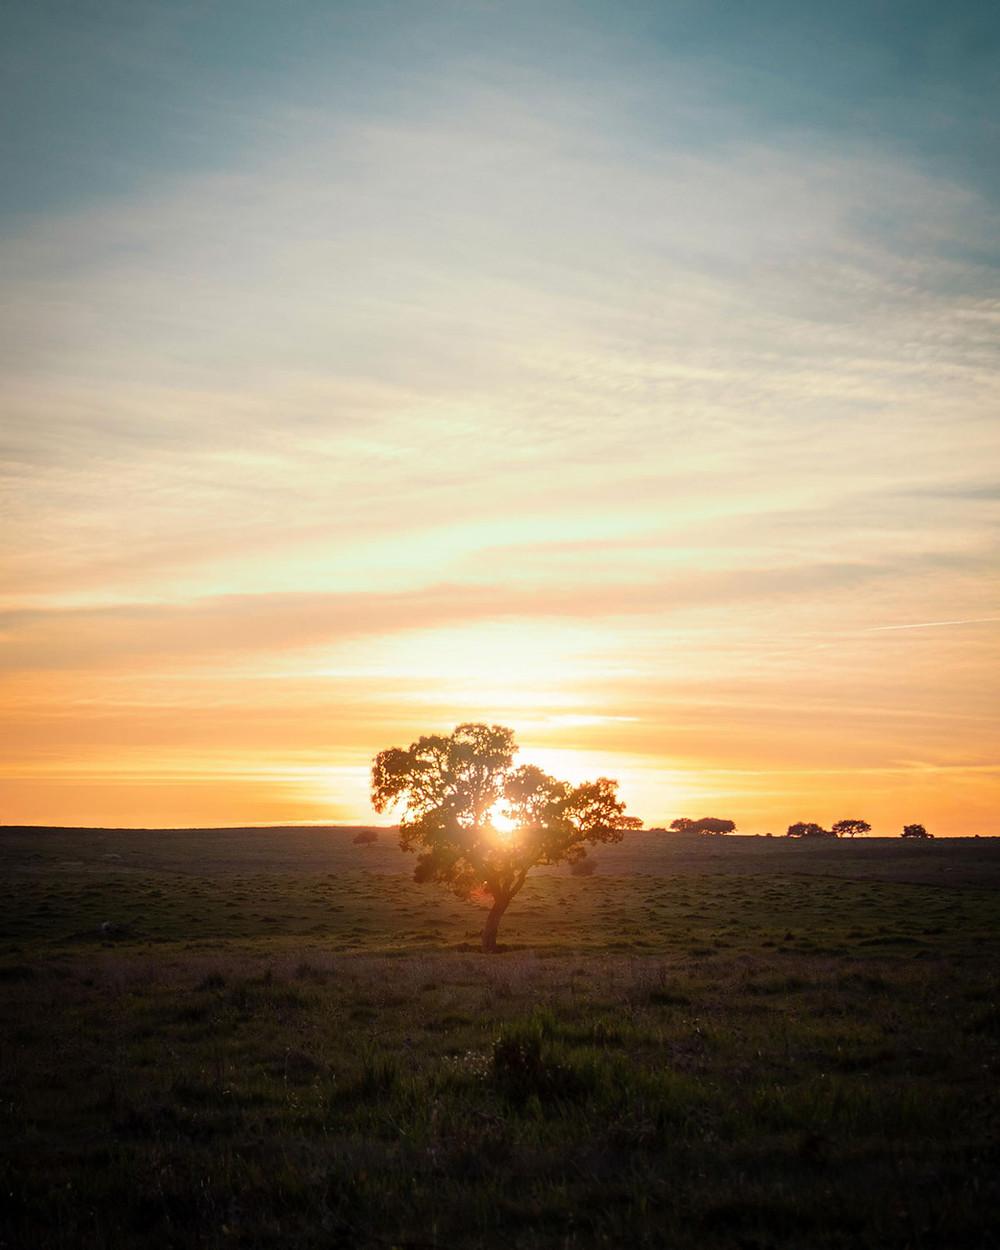 Sunset over cork tree Alentejo Portugal